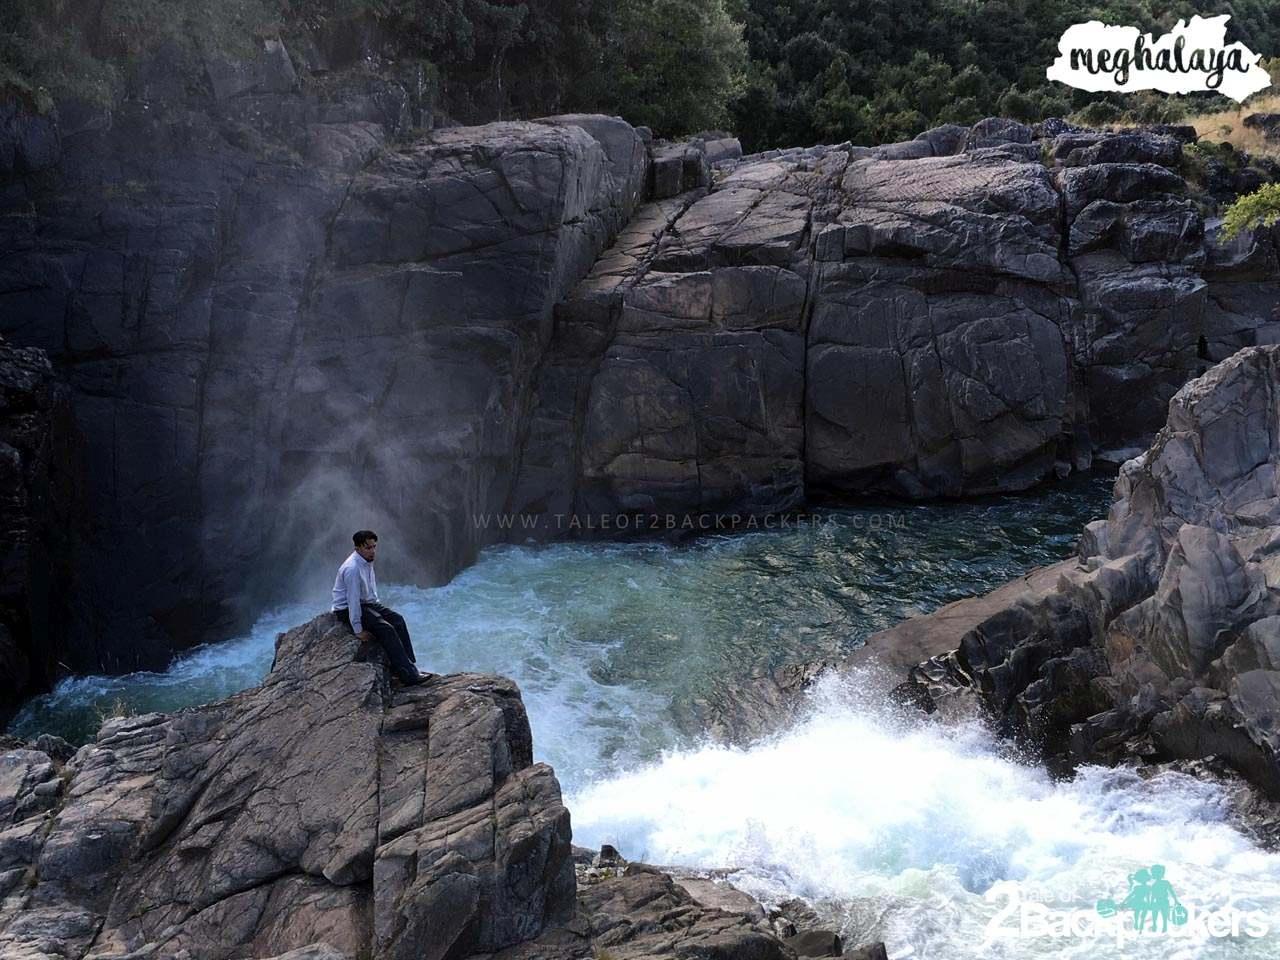 Nonghknum Islang Meghalaya travel Guide